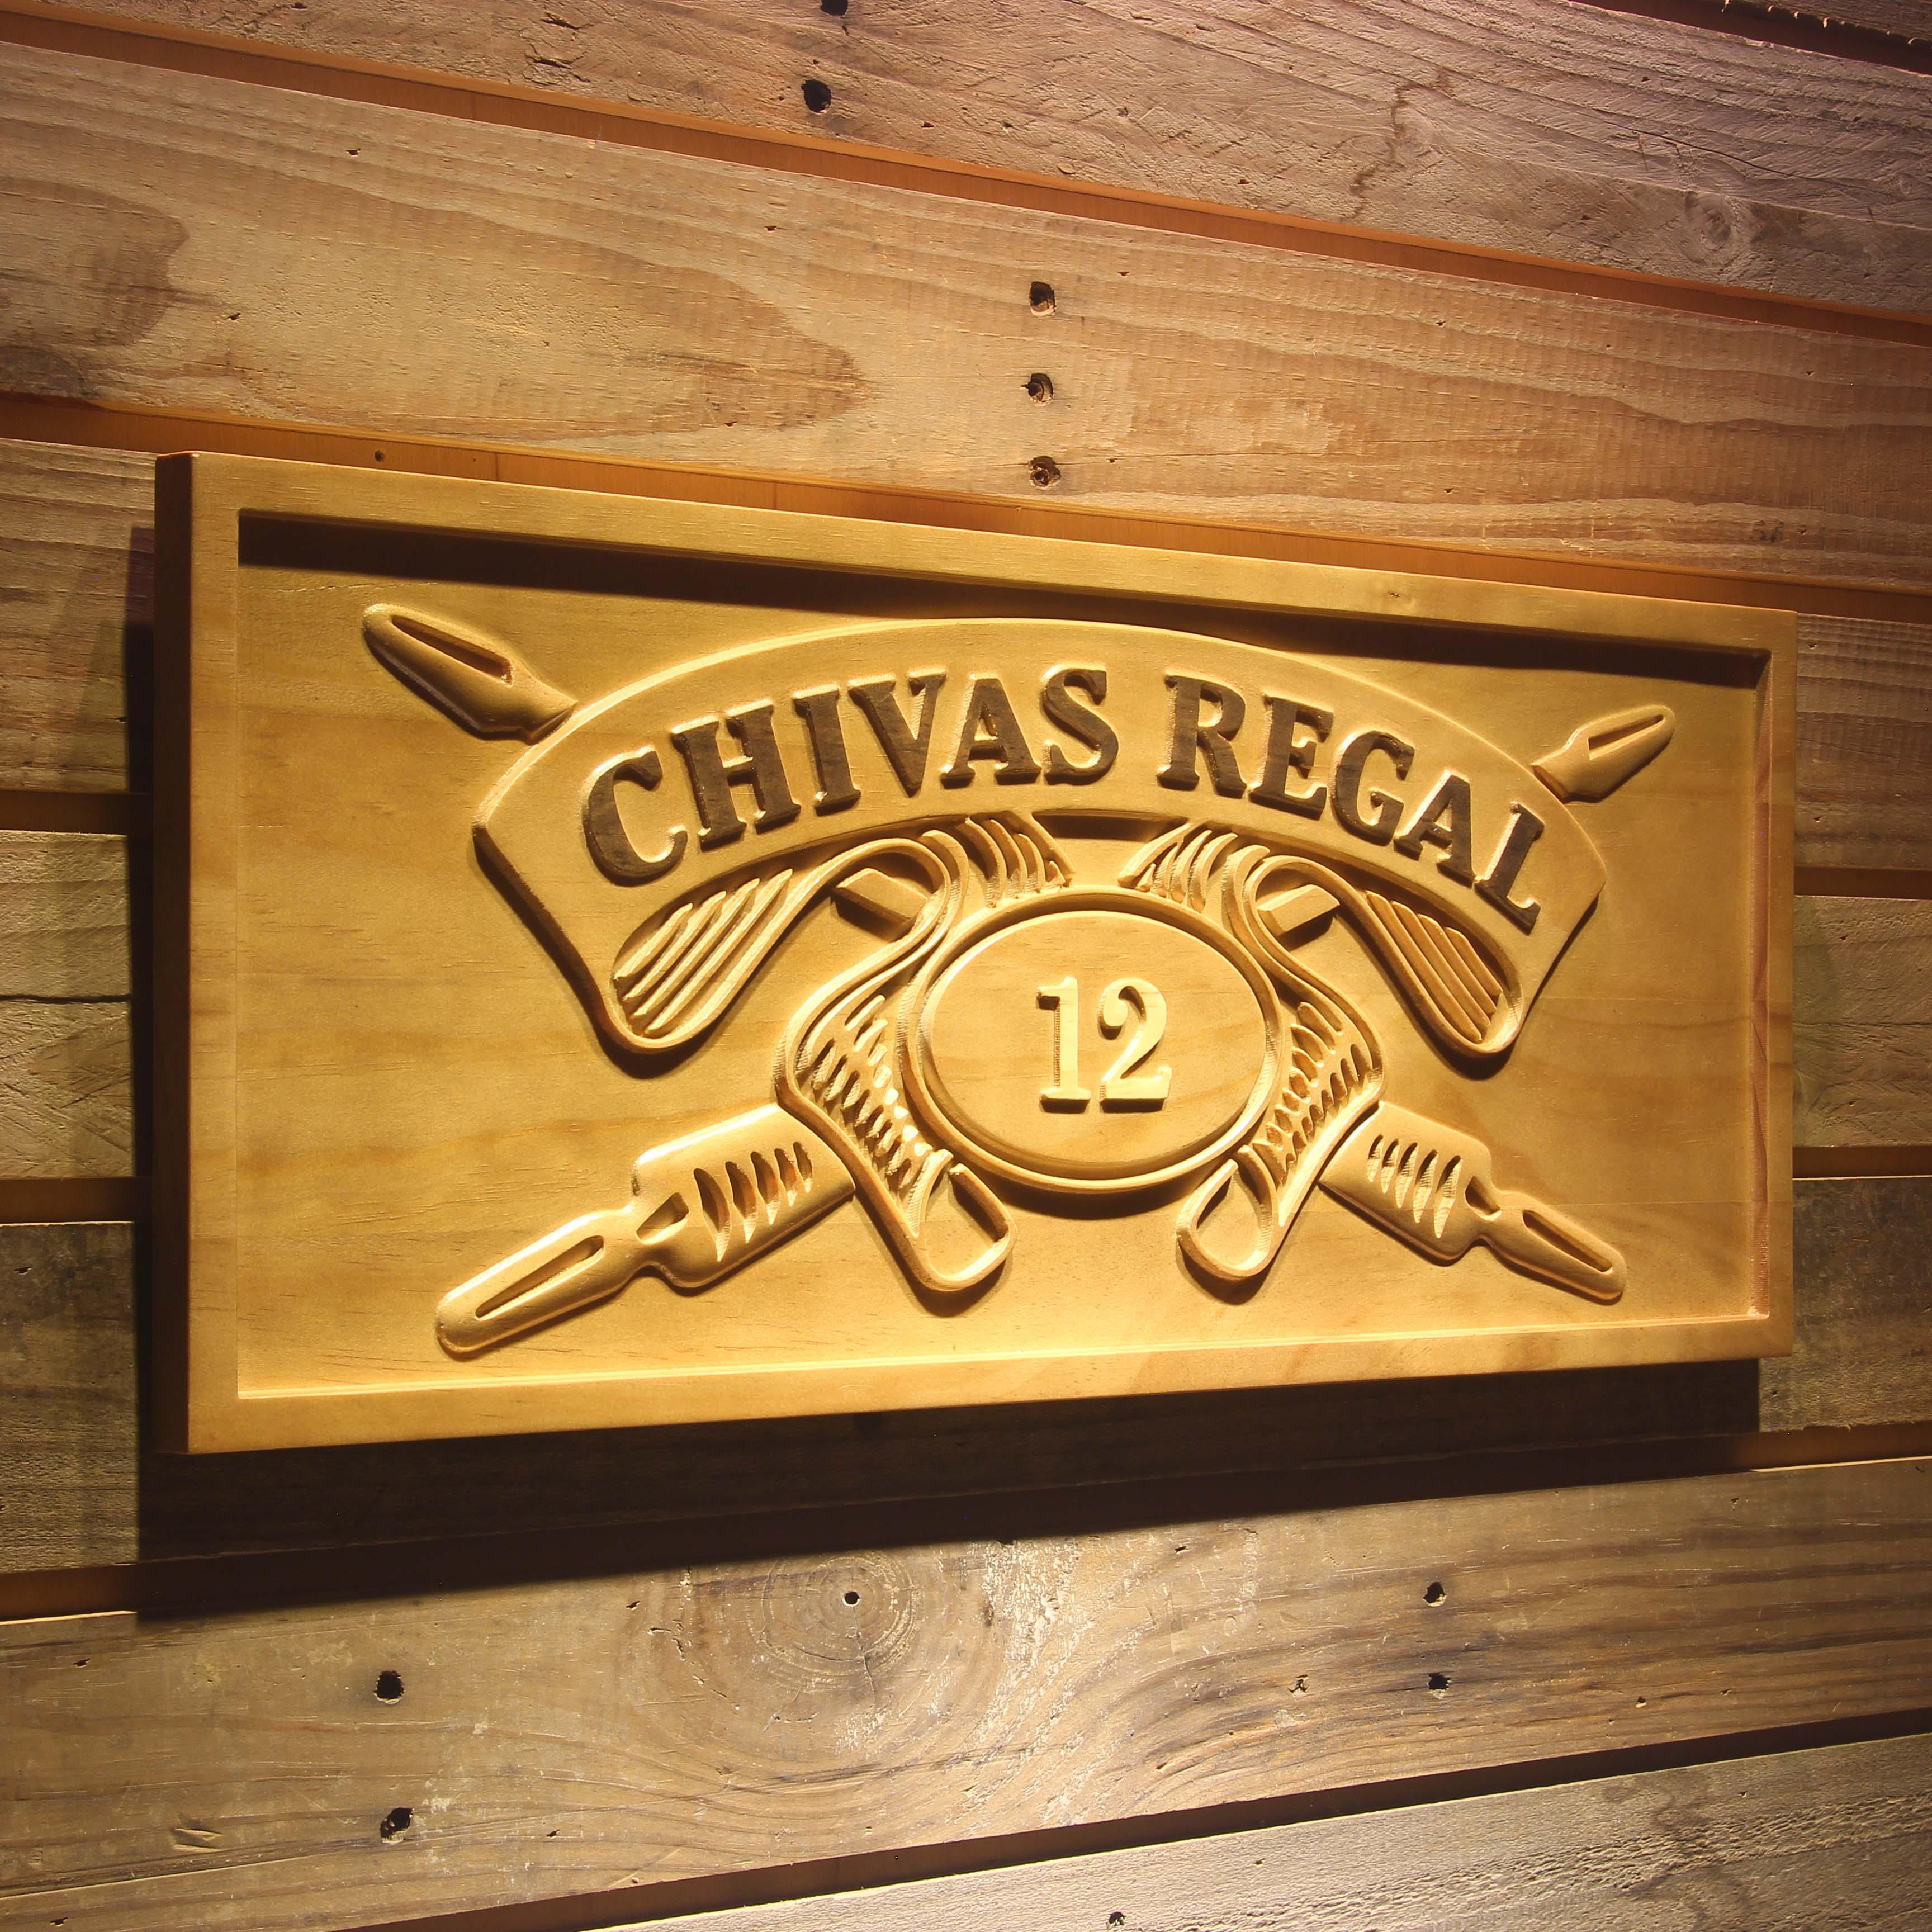 Chivas Regal 12 Whisky 3D Wooden Sign